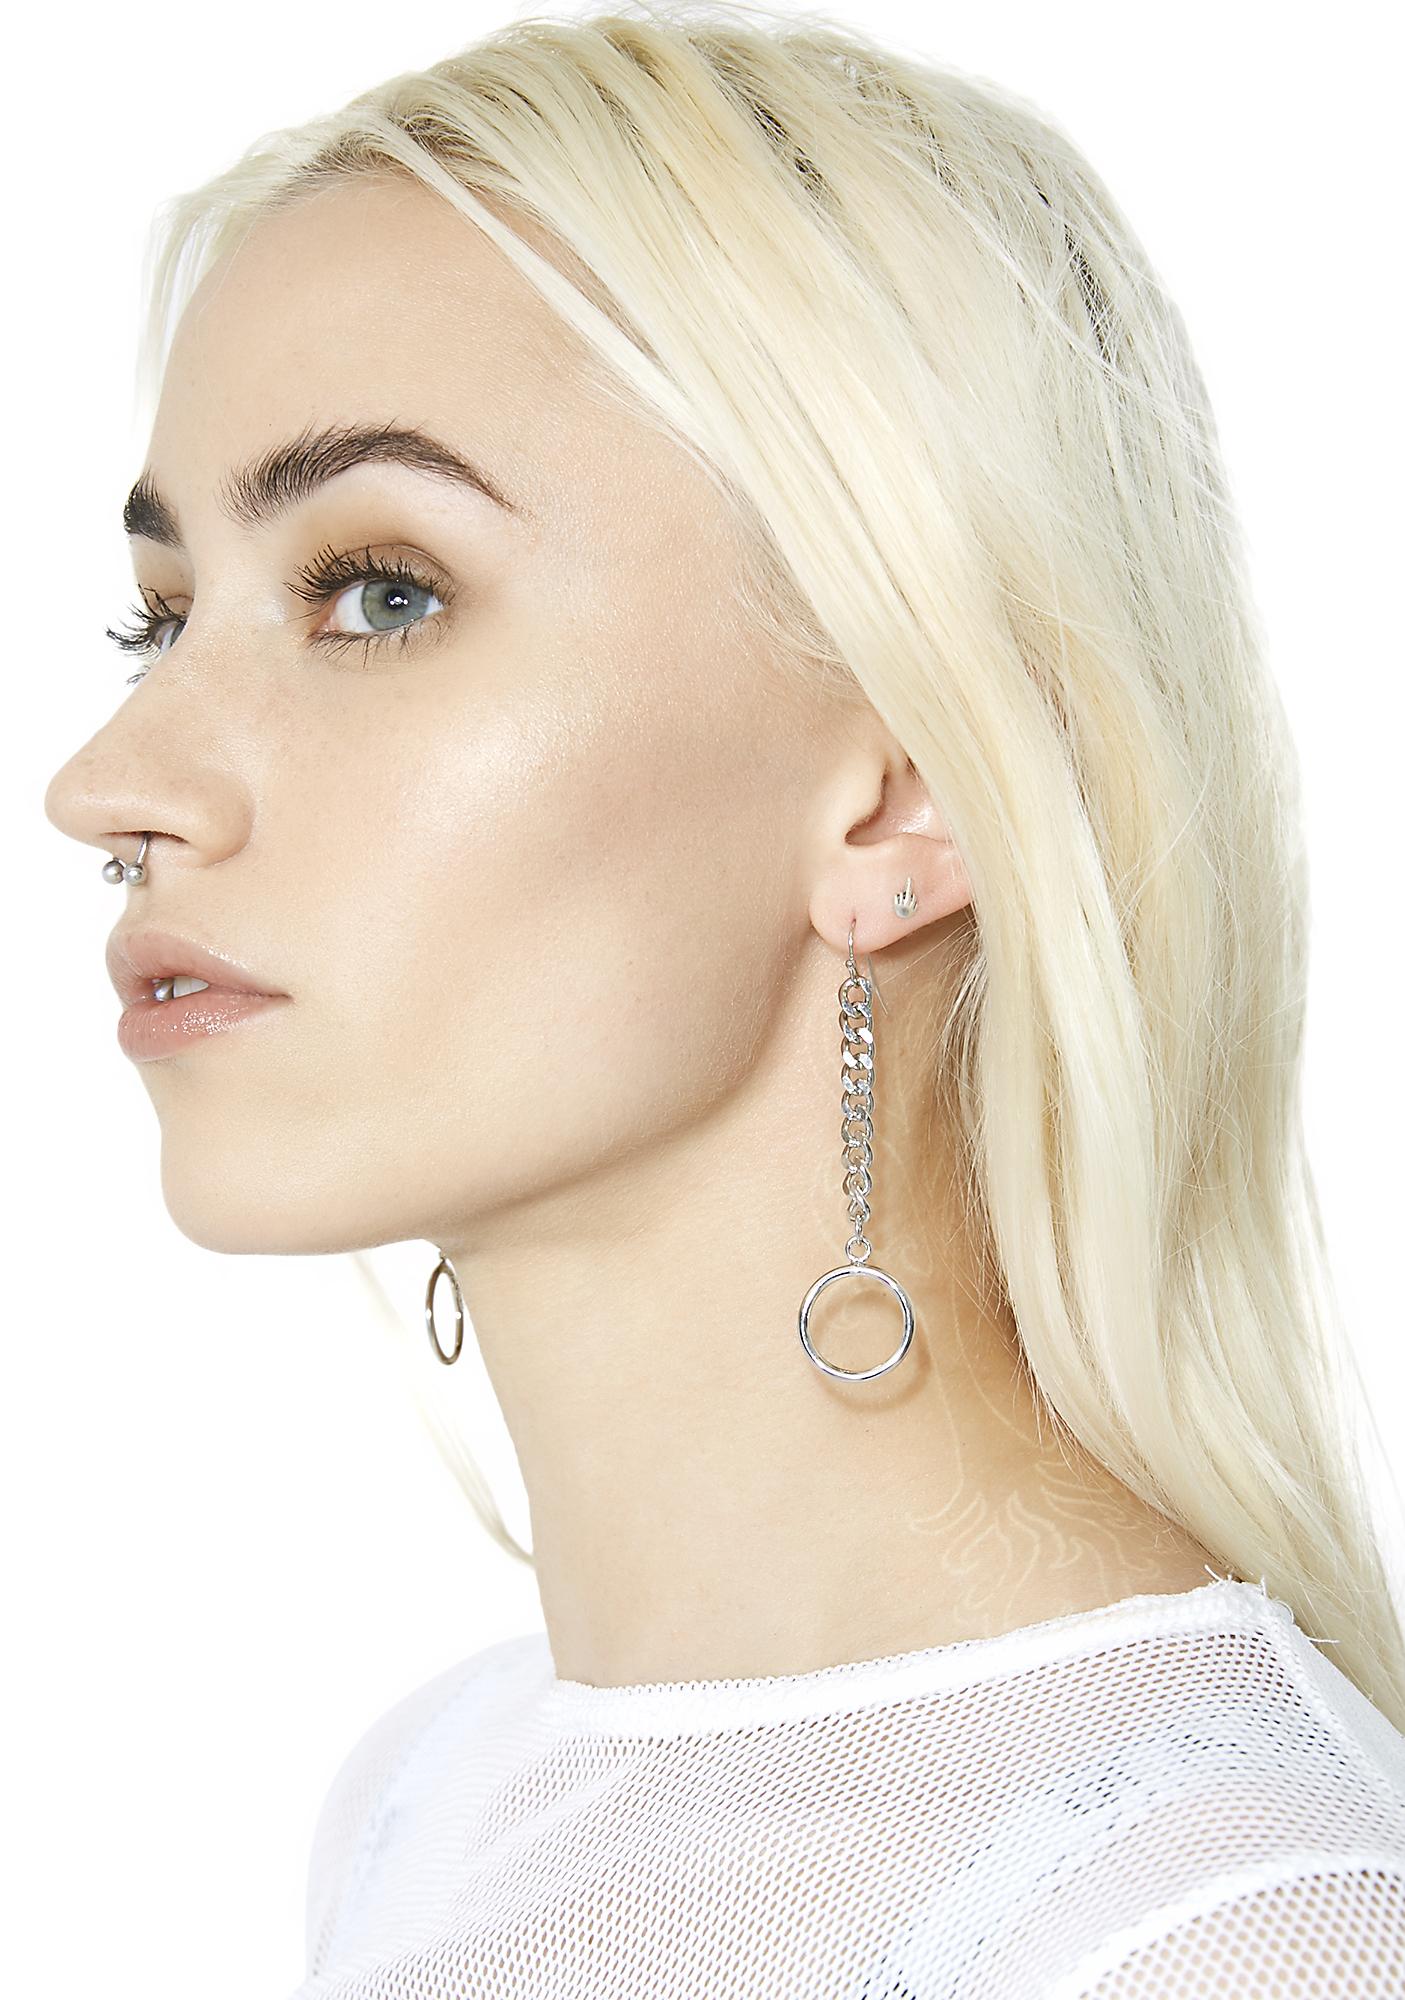 Down Low O-Ring Earrings